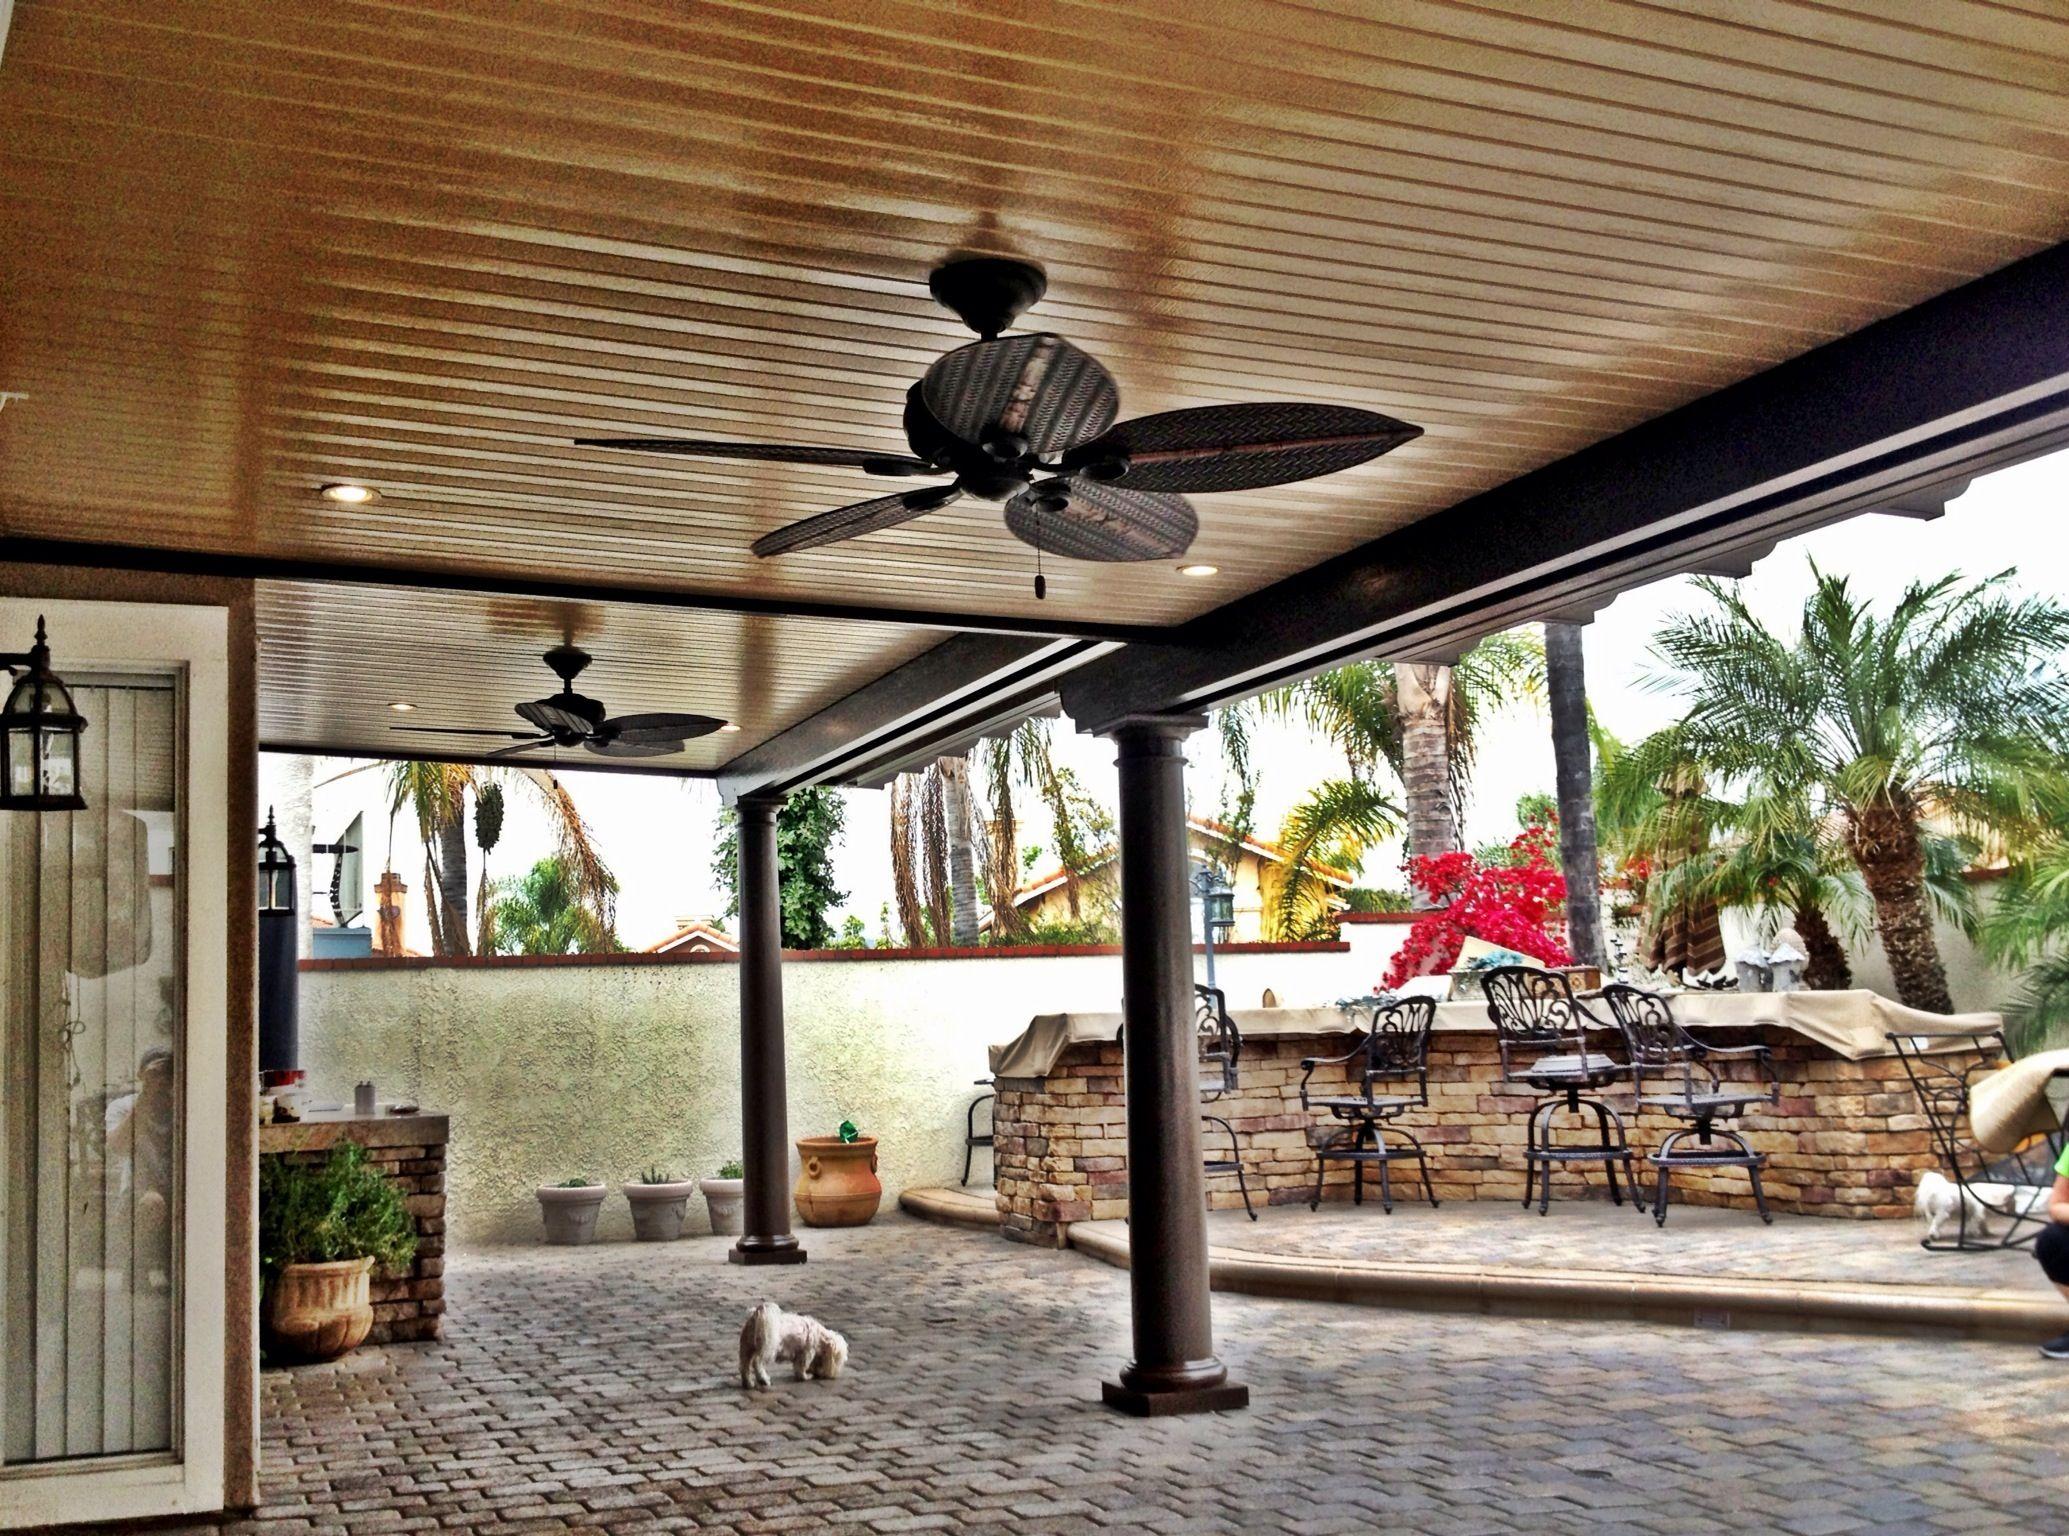 Alumawood Diy patio kit